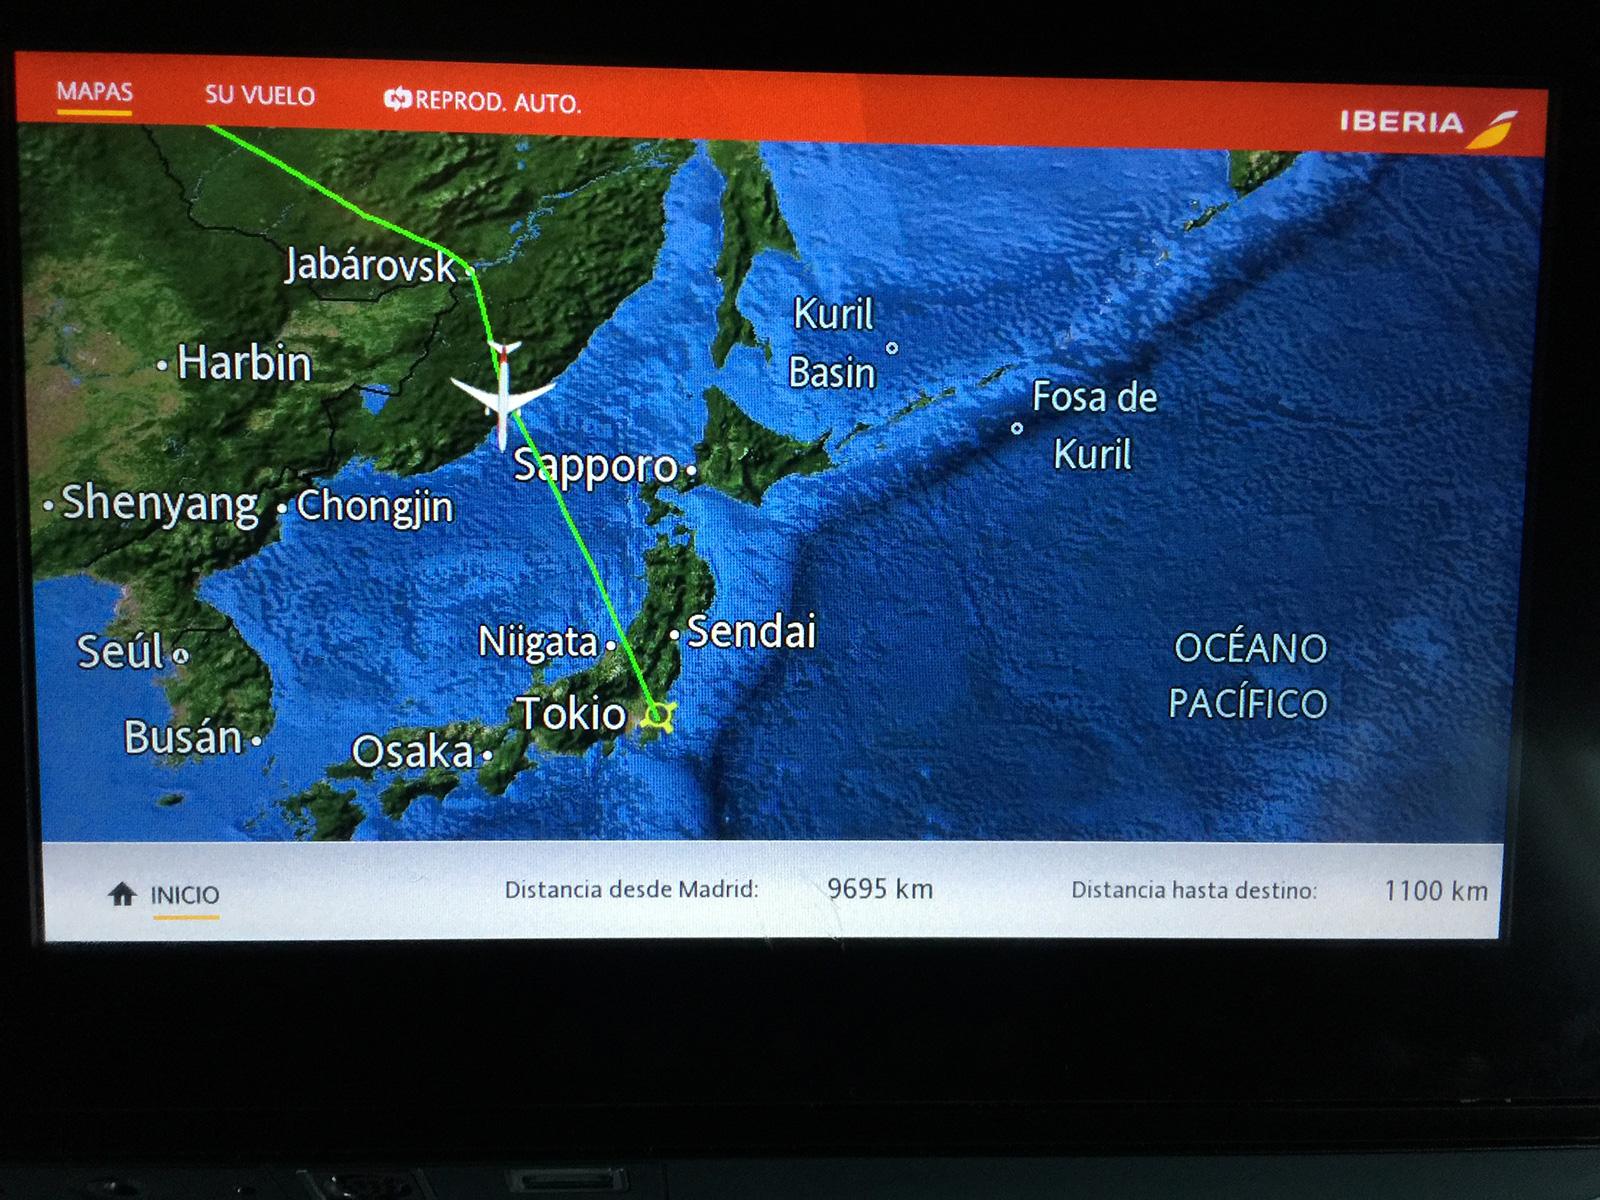 Acercándonos a Japón desde Rusia con un Avión de Iberia